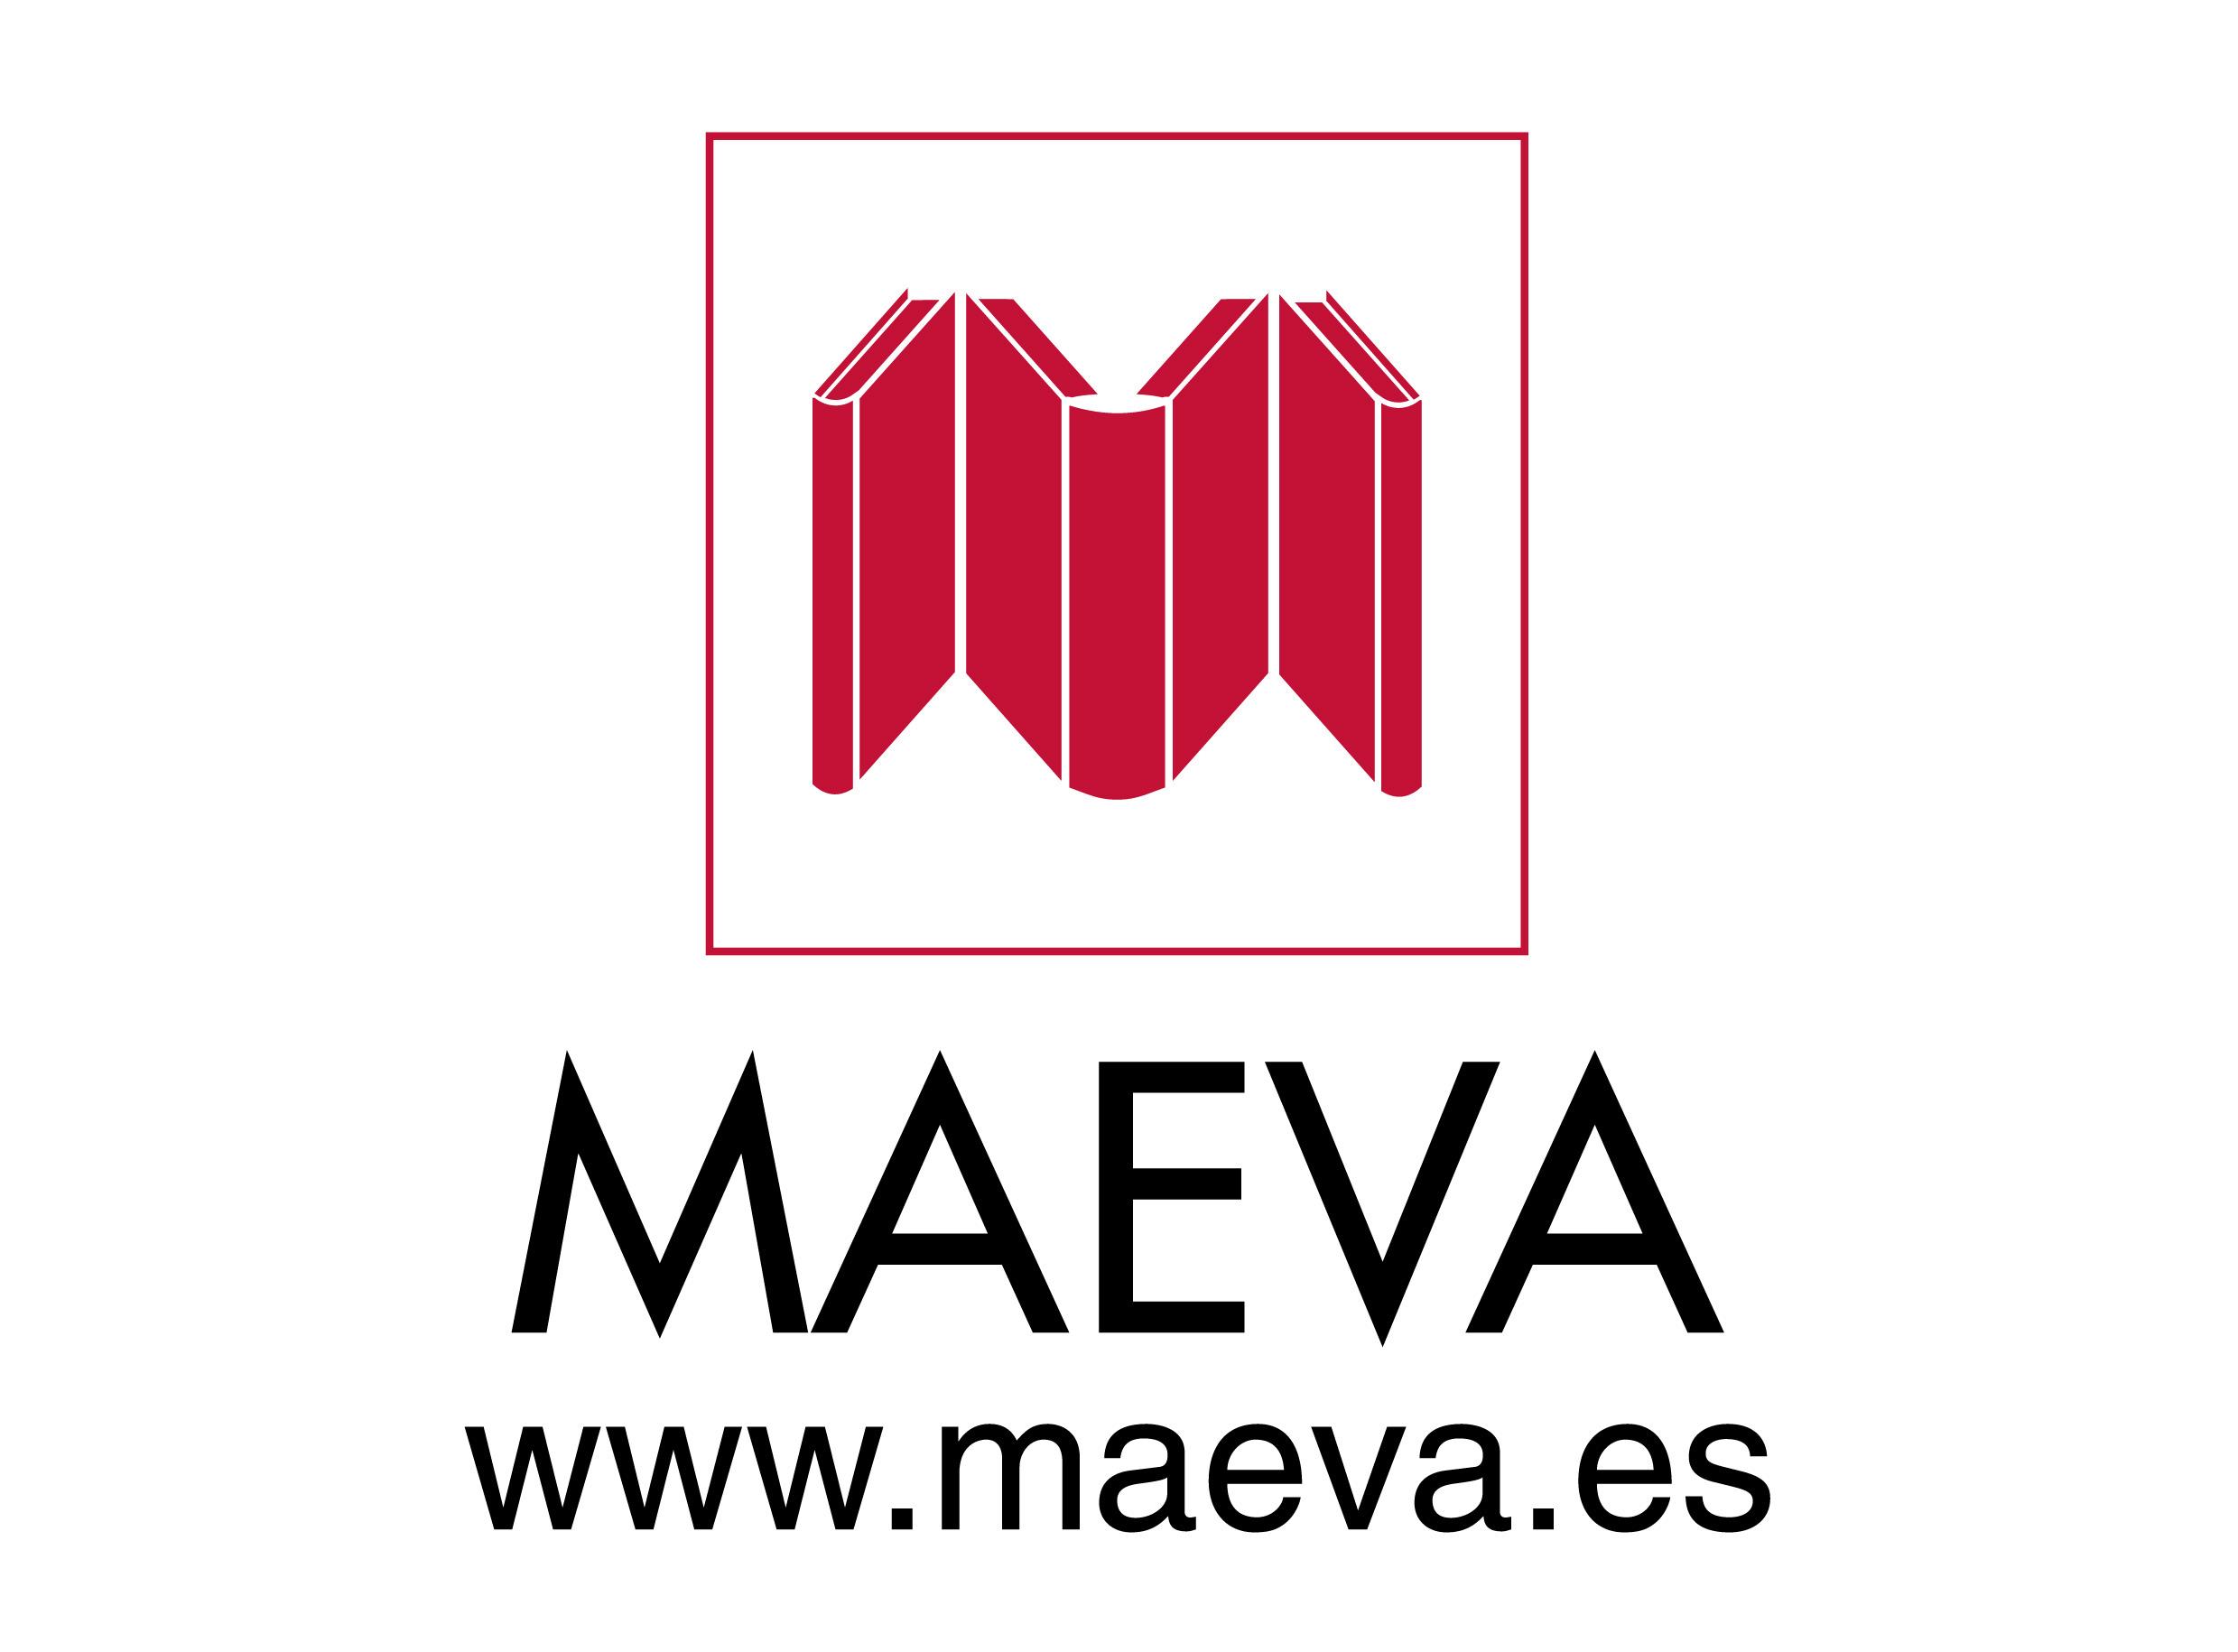 https://www.maeva.es/